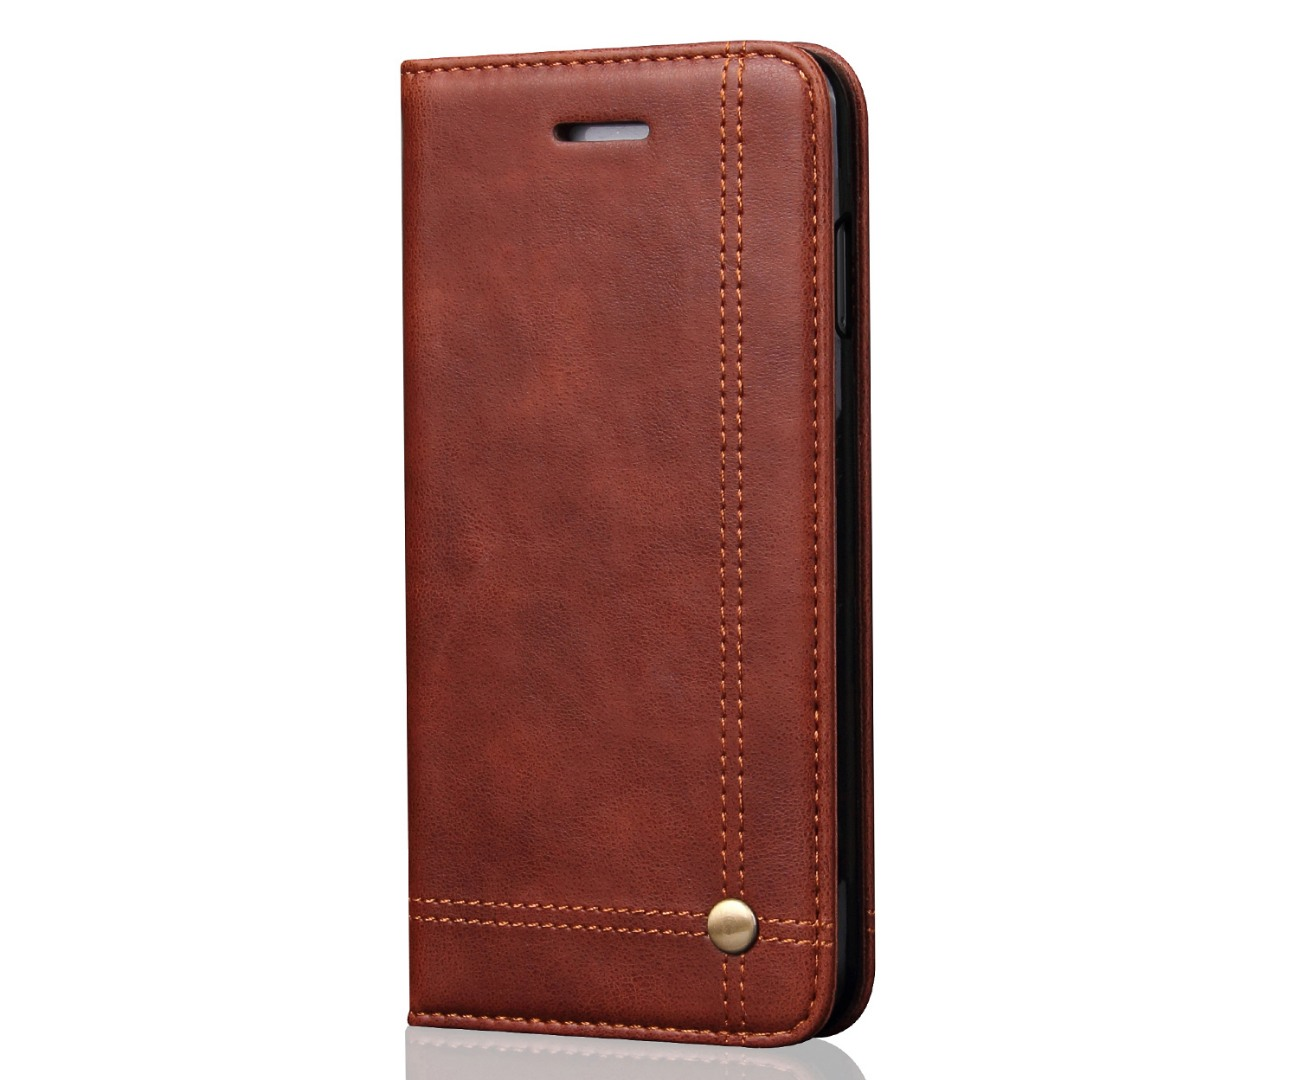 Husa piele, tip portofel, cusaturi ornamentale, stand, inchidere magnetica, iPhone 8 Plus / 7 Plus - CaseMe, Maro coffee